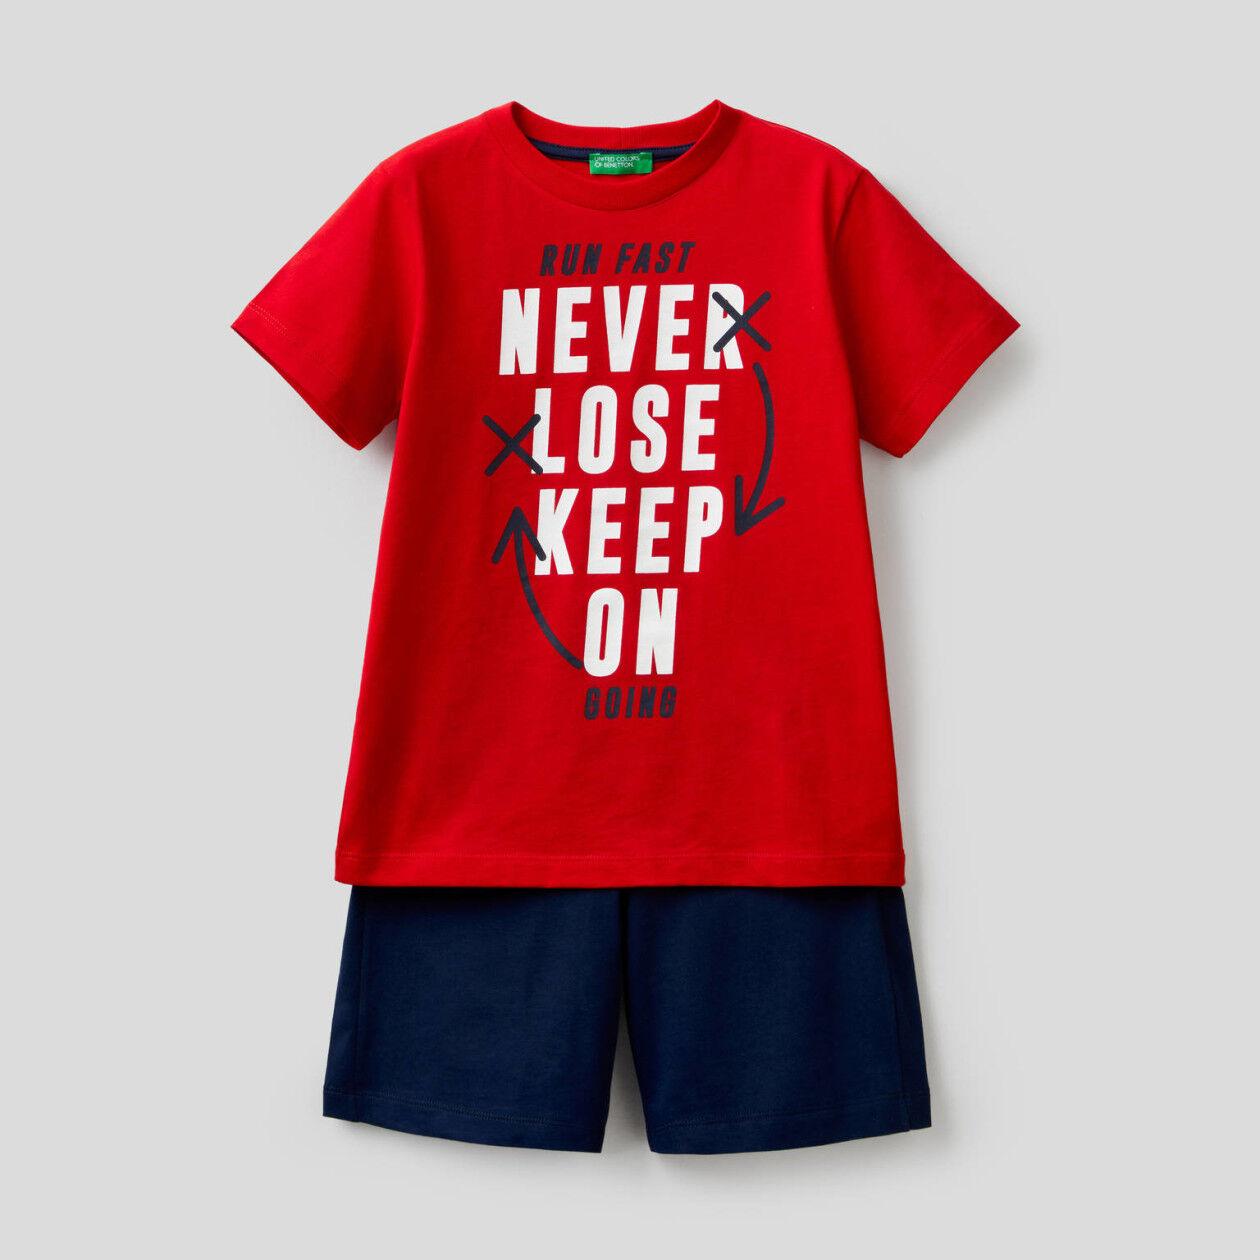 T-shirt and bermudas set